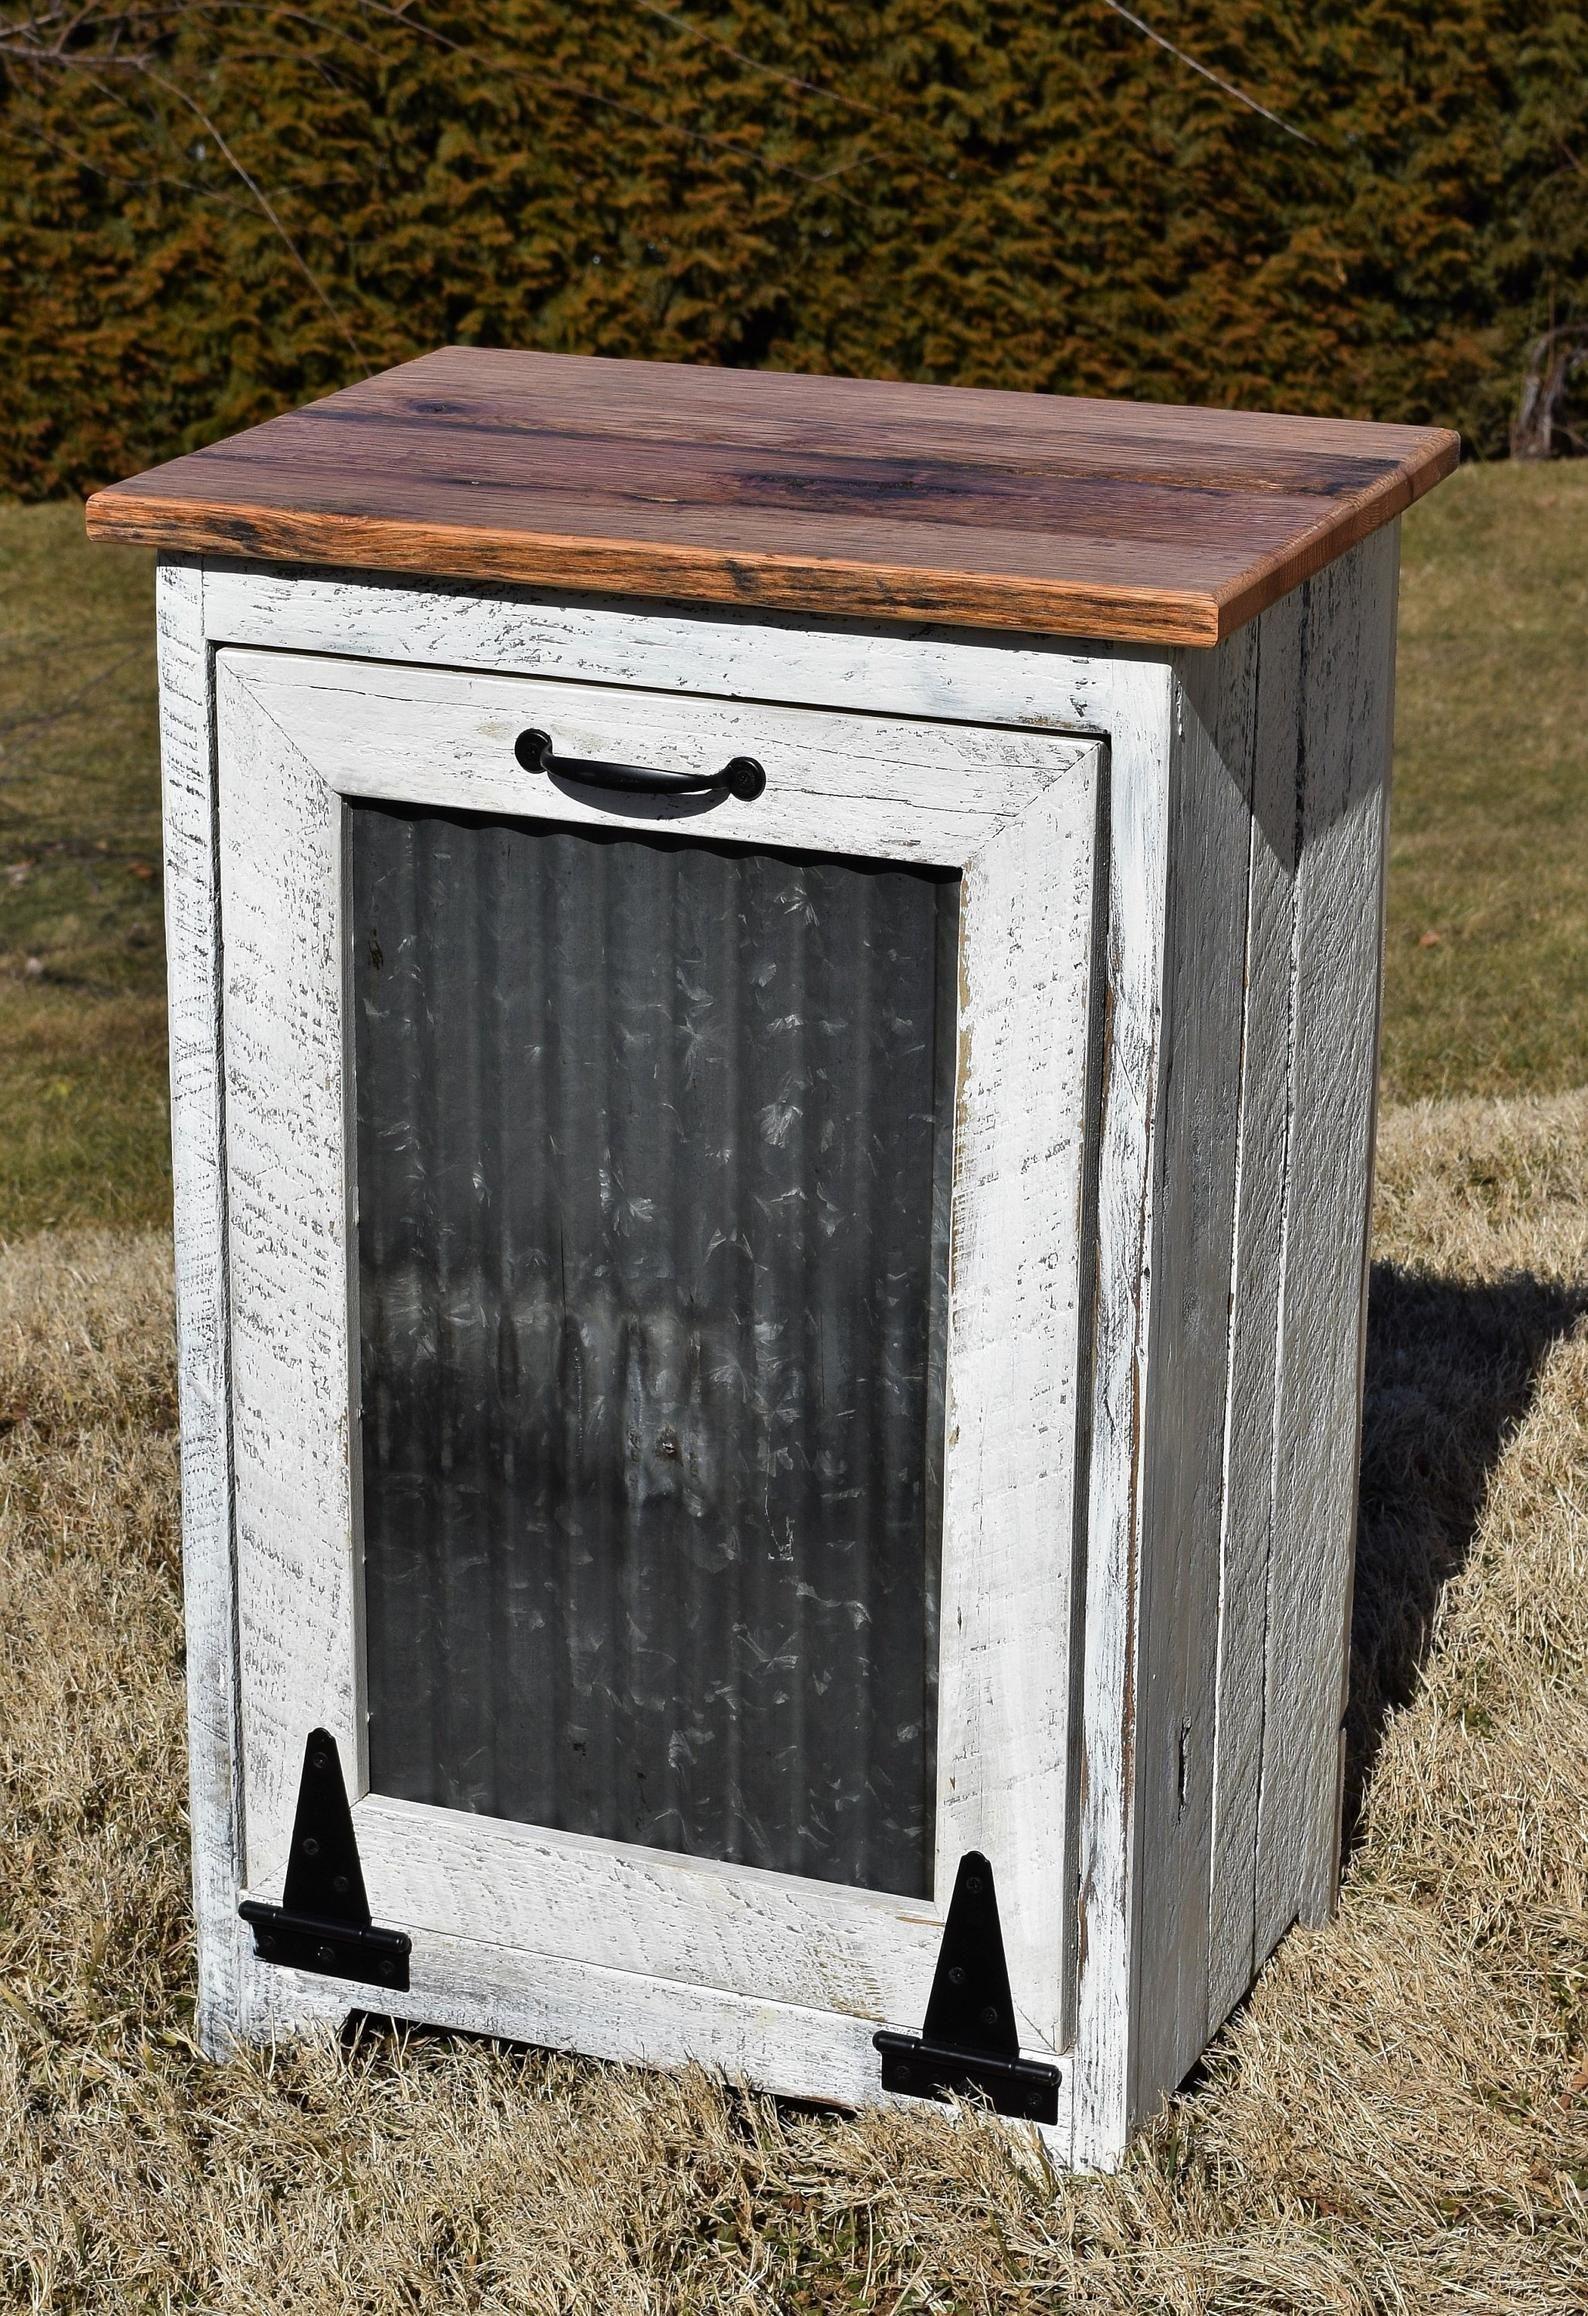 Reclaimed barn wood Distressed Trash Bin Wood Trash Bin Amish handmade